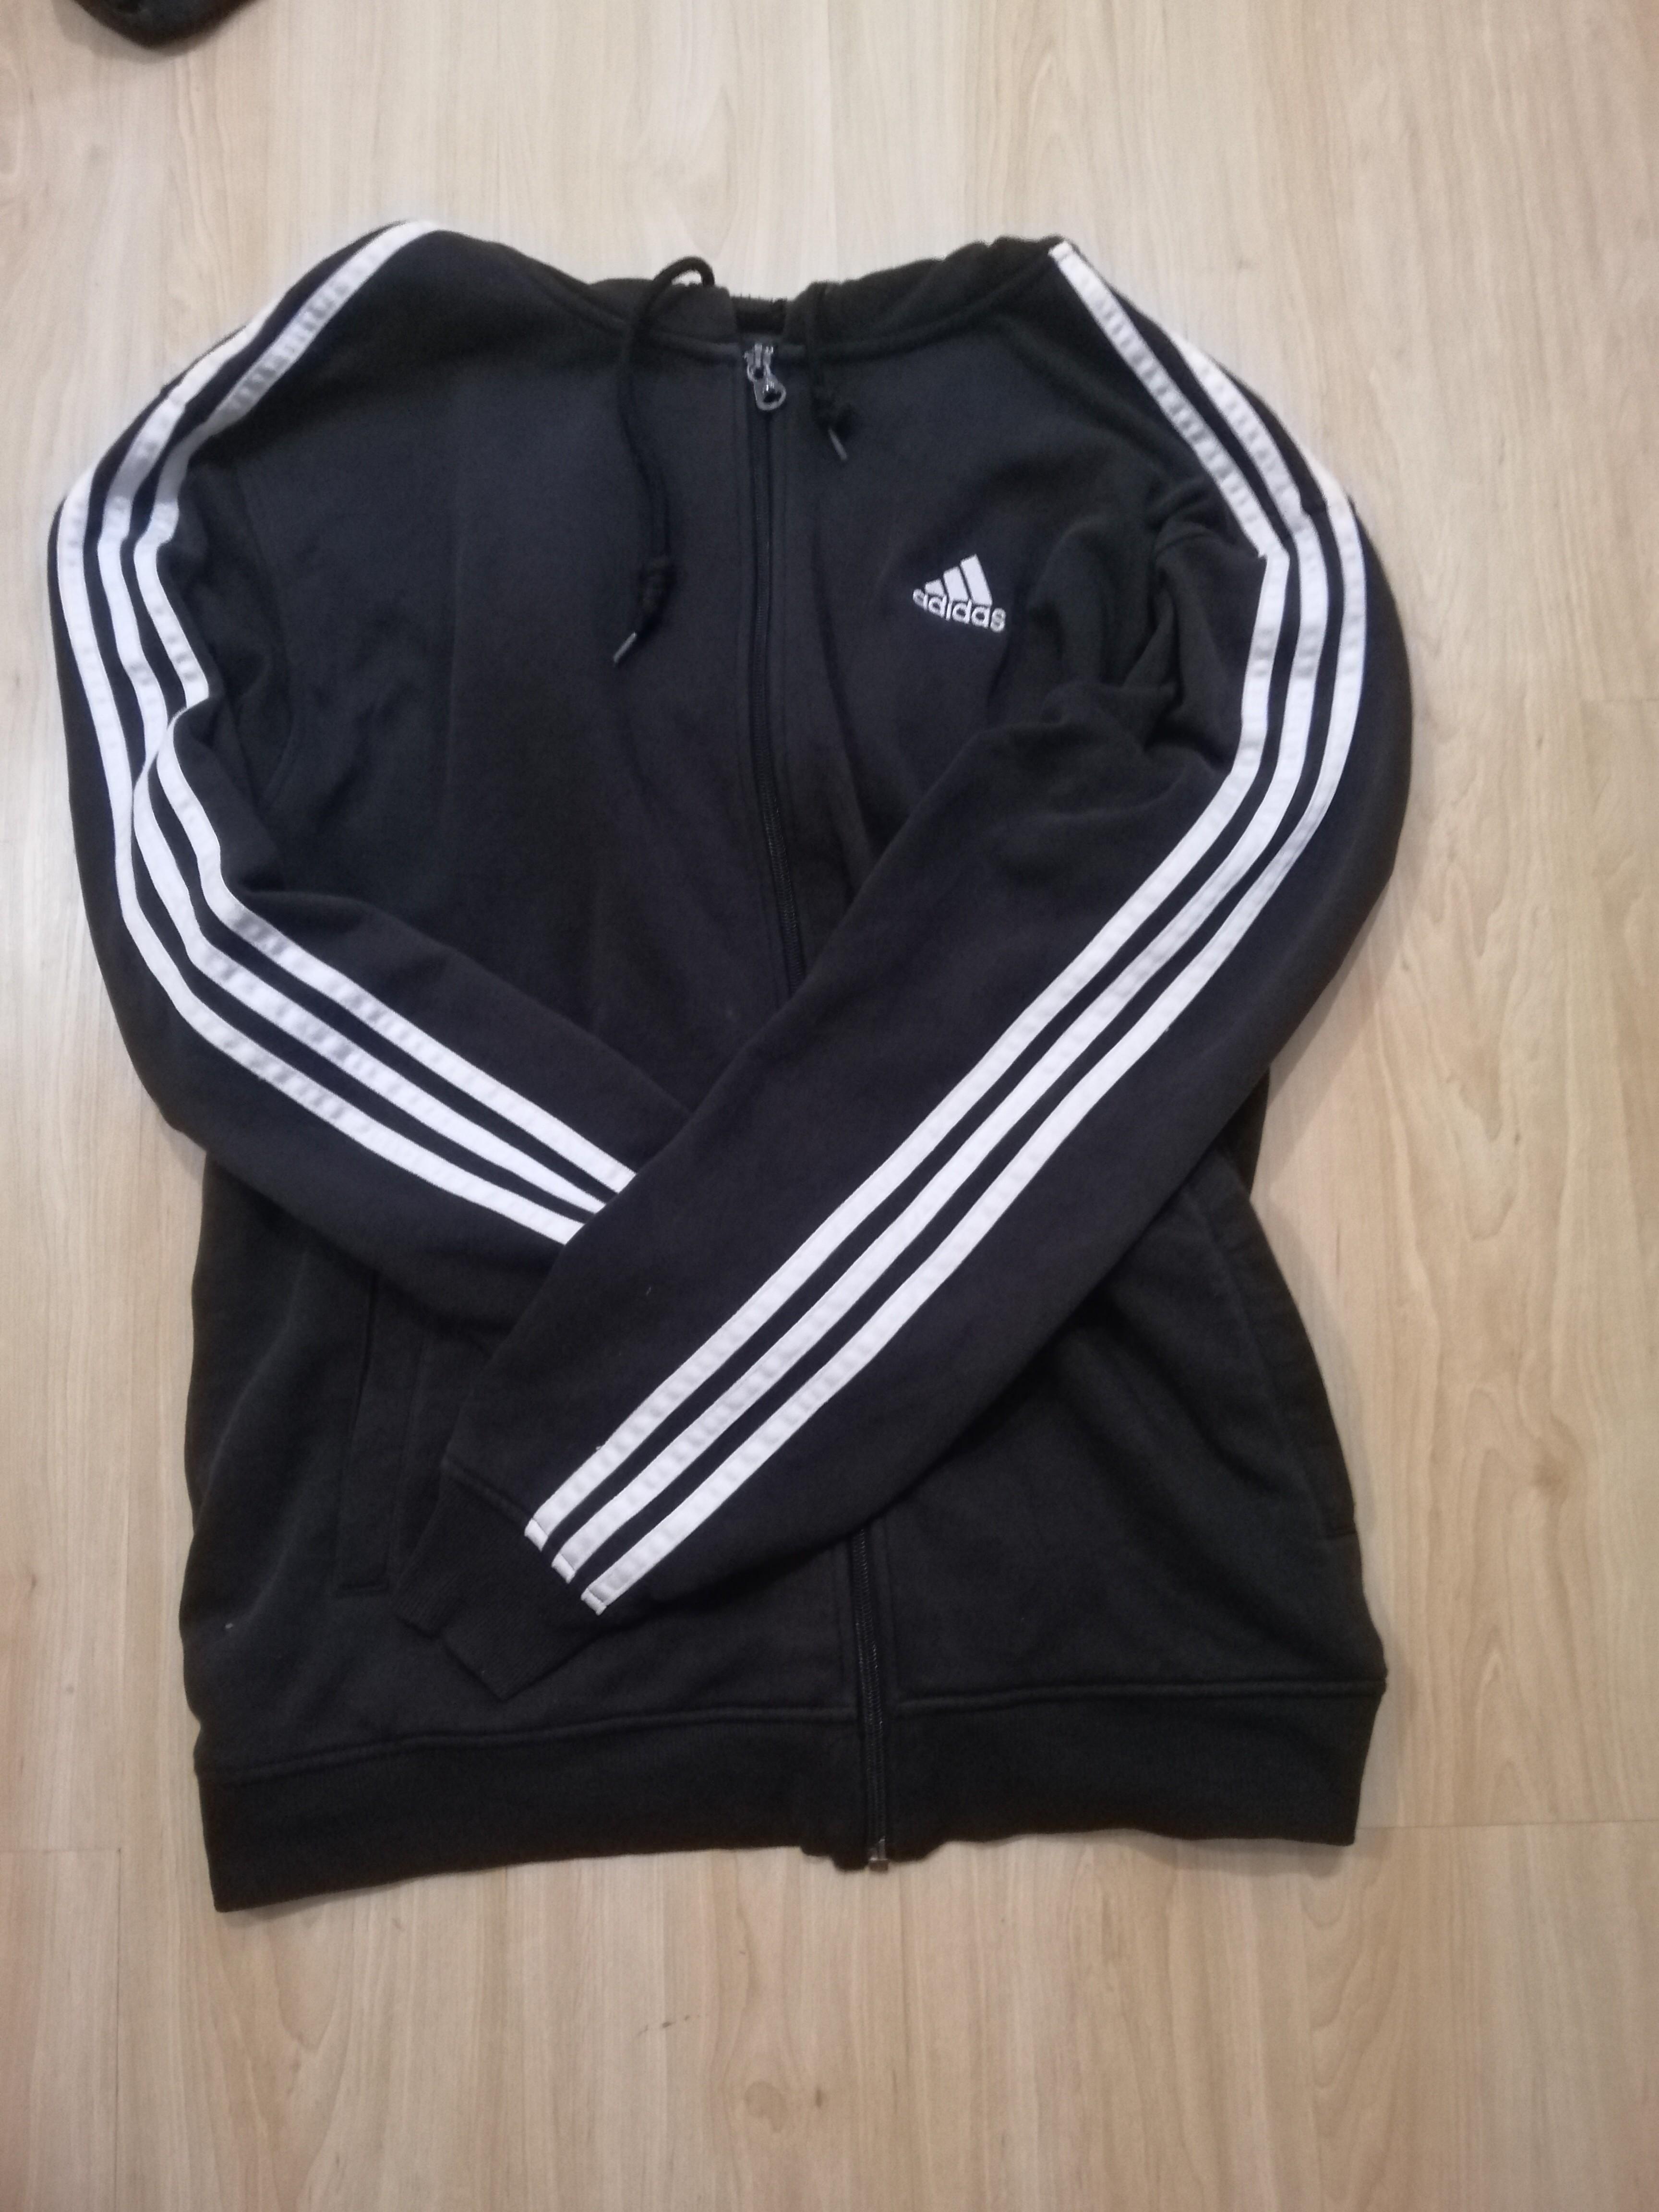 80d223748157 Adidas Track Jacket (Authentic   Original) REPRICED